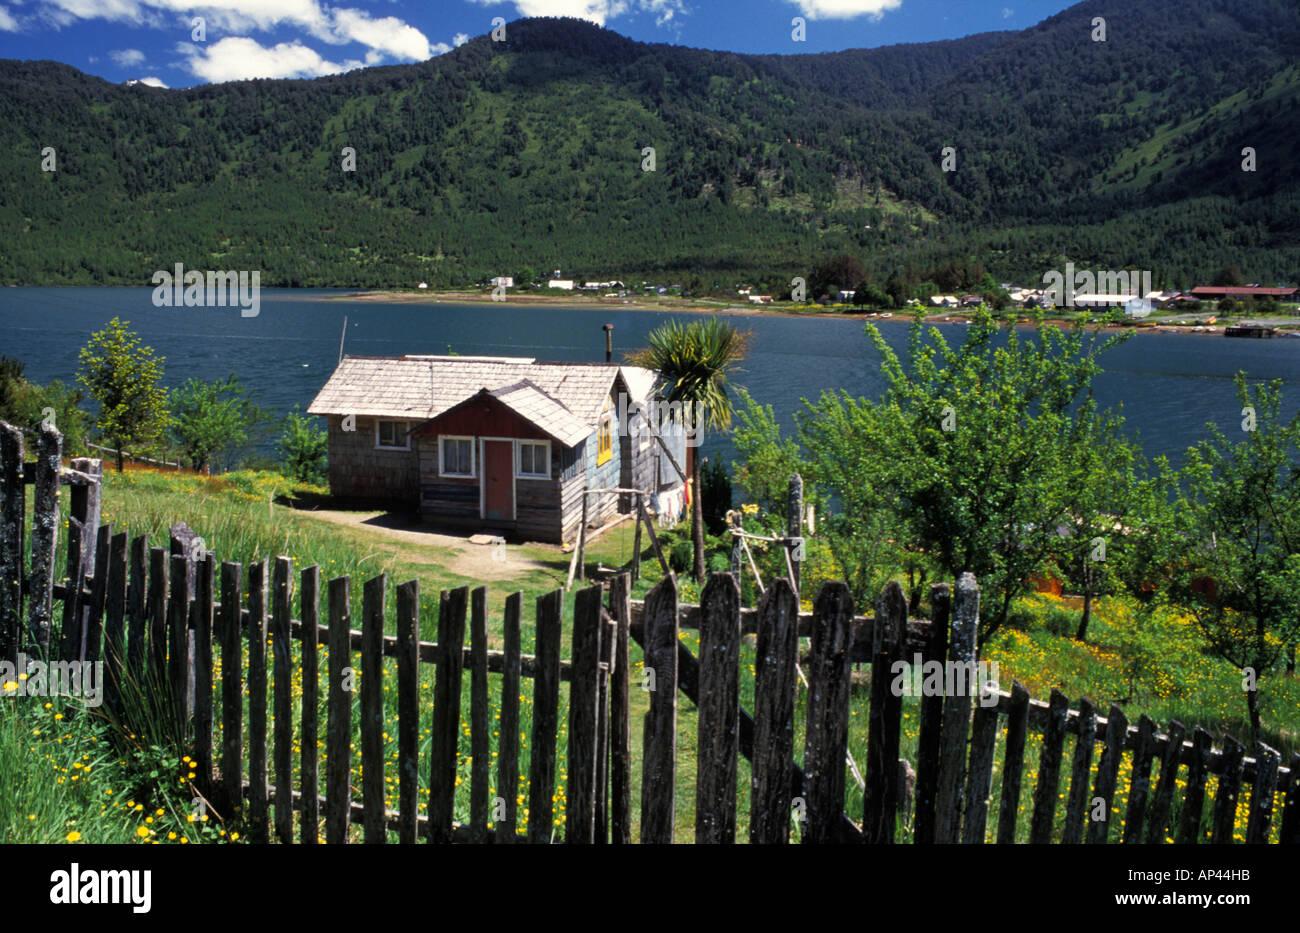 Chile, Patagonia, Puerto Puyuhuapi. - Stock Image